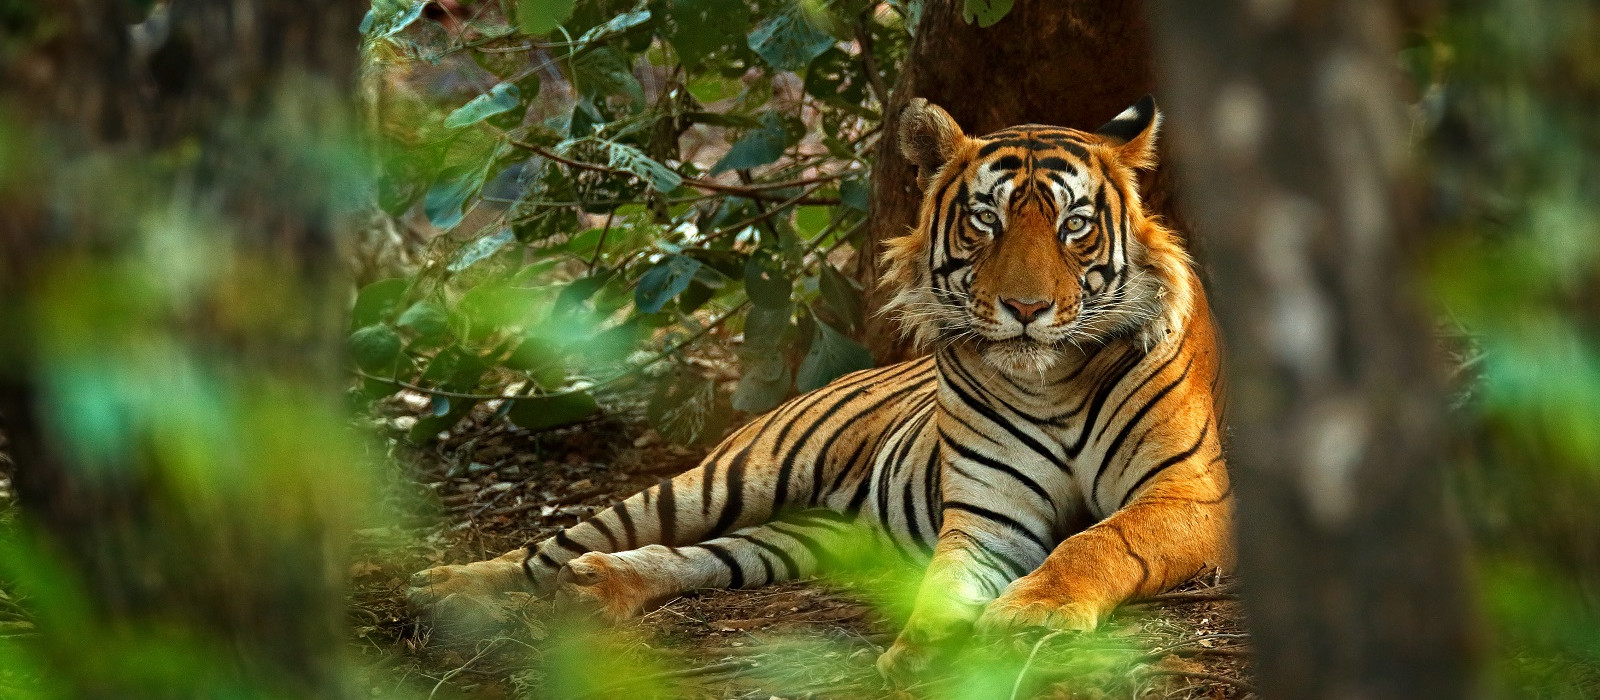 Tiger Safari in India and the Taj Mahal Tour Trip 1